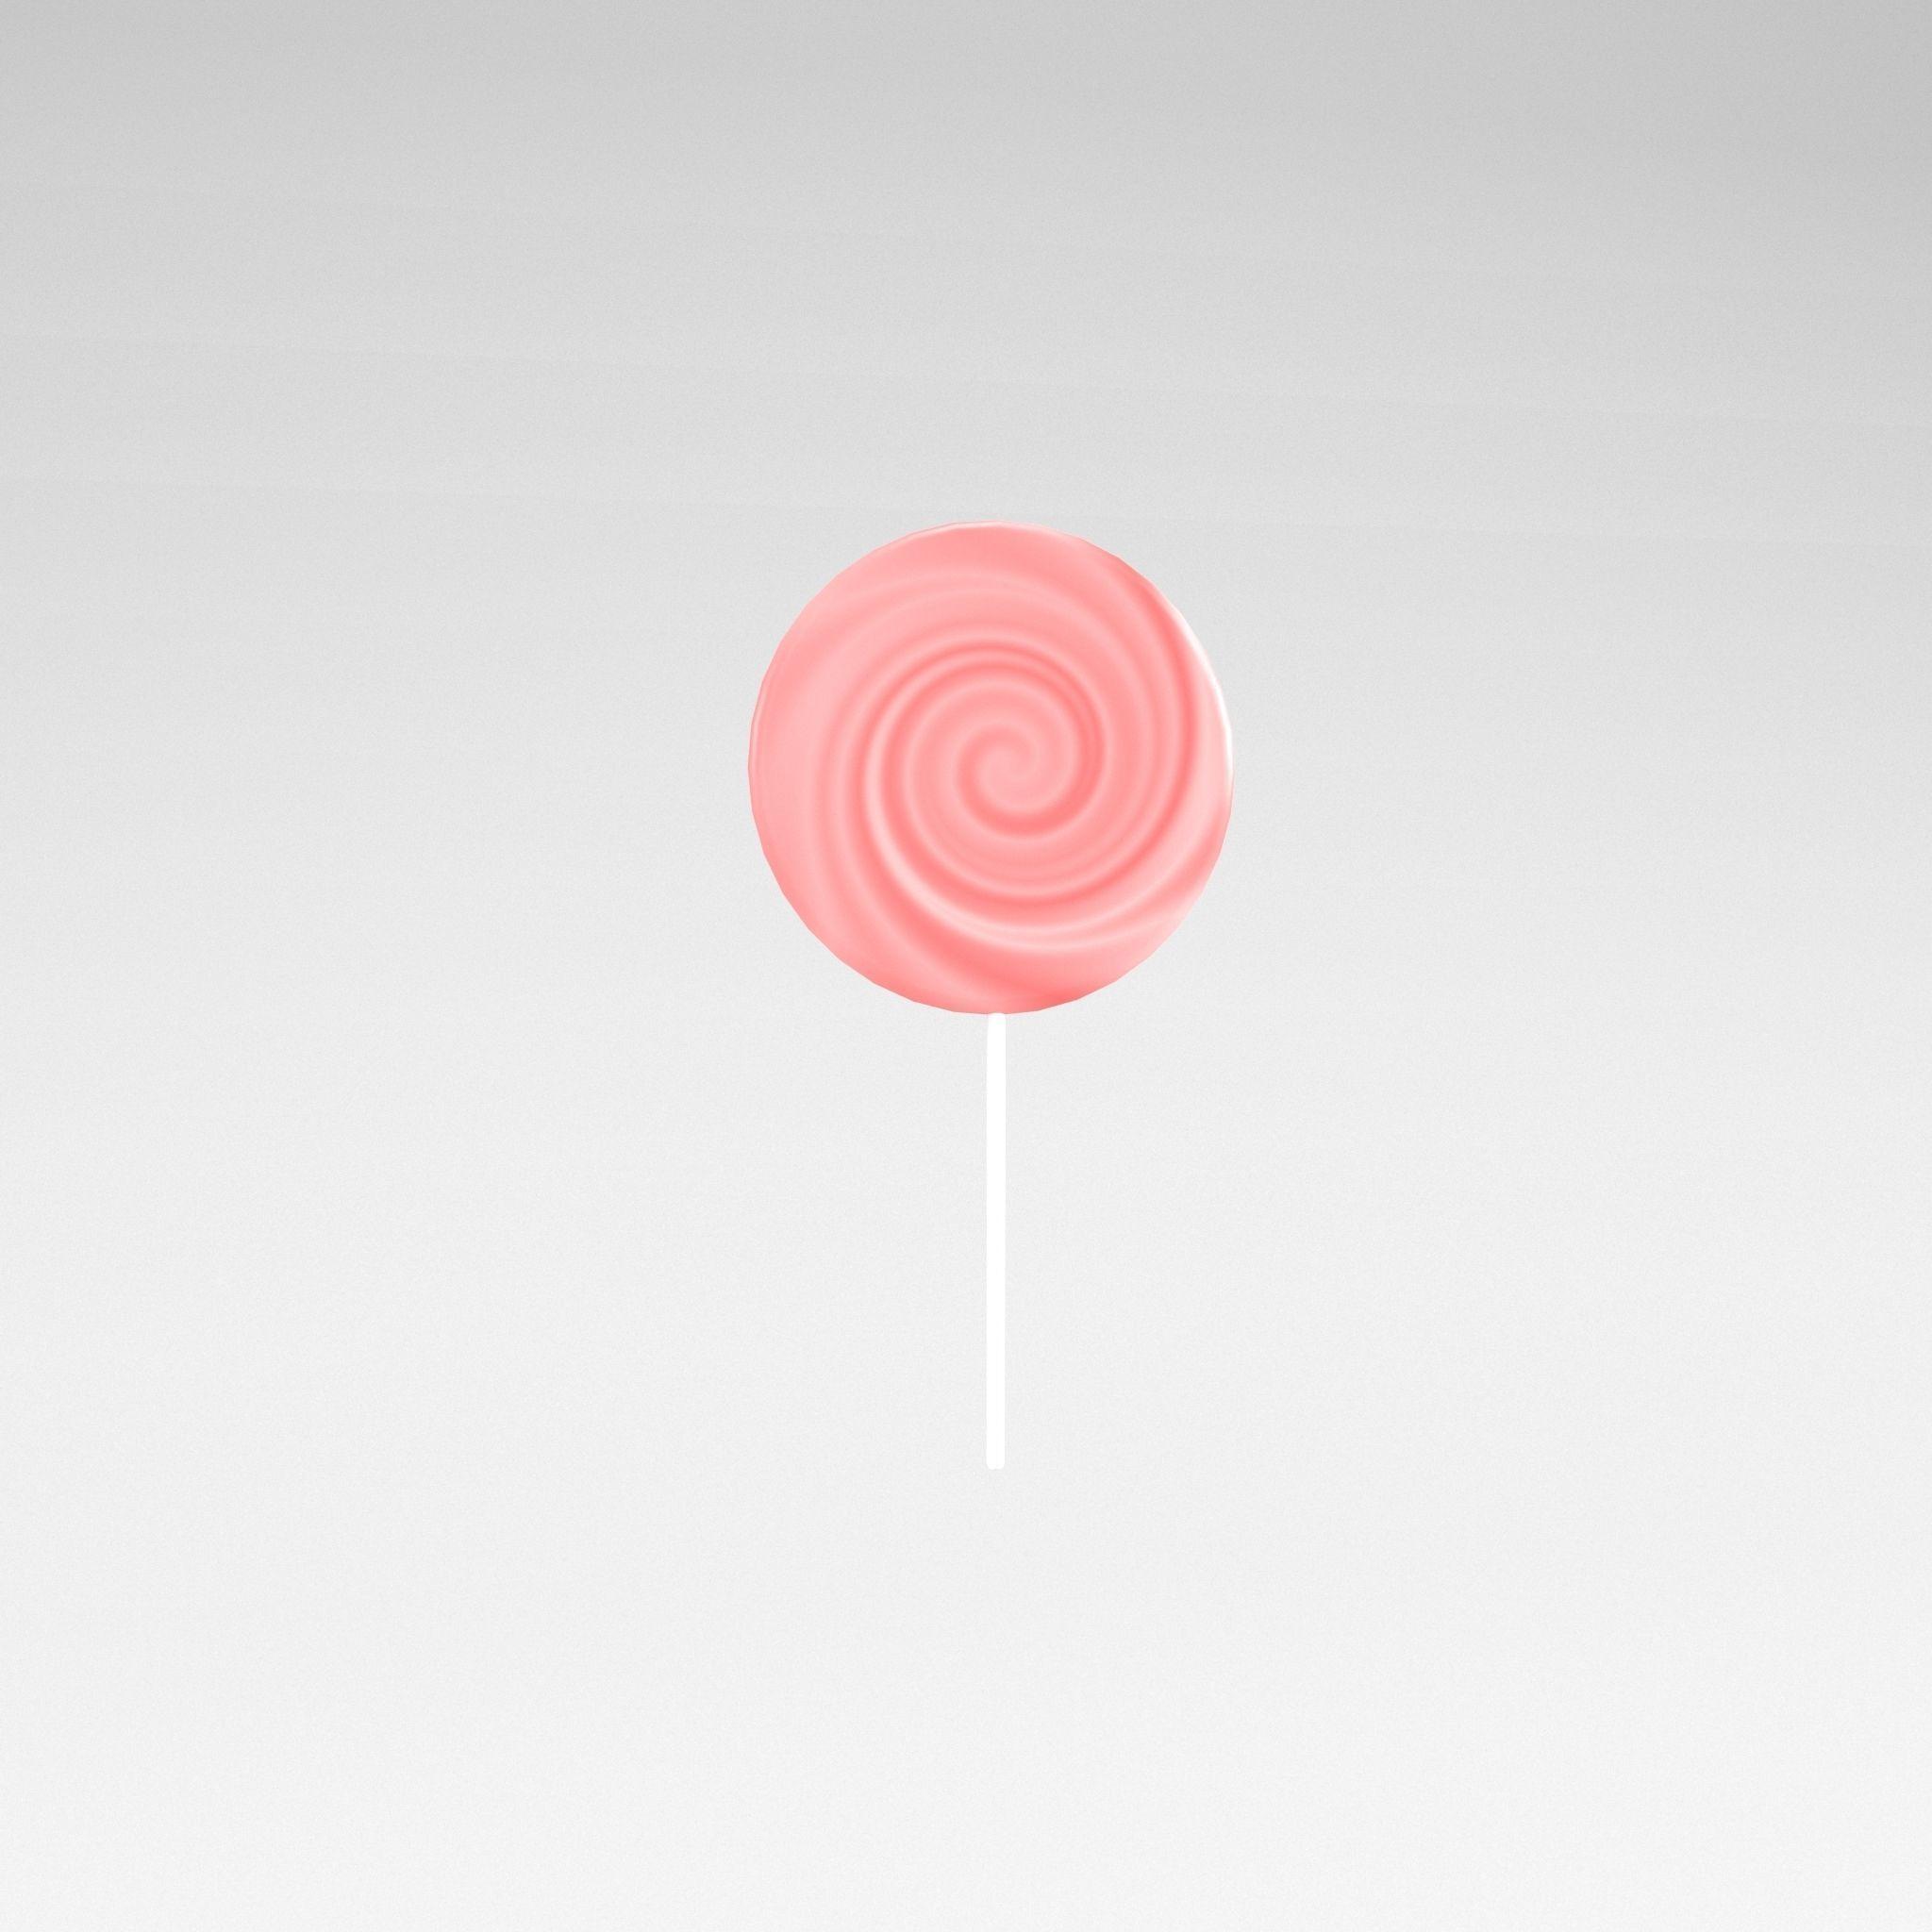 Lollipop v1 003